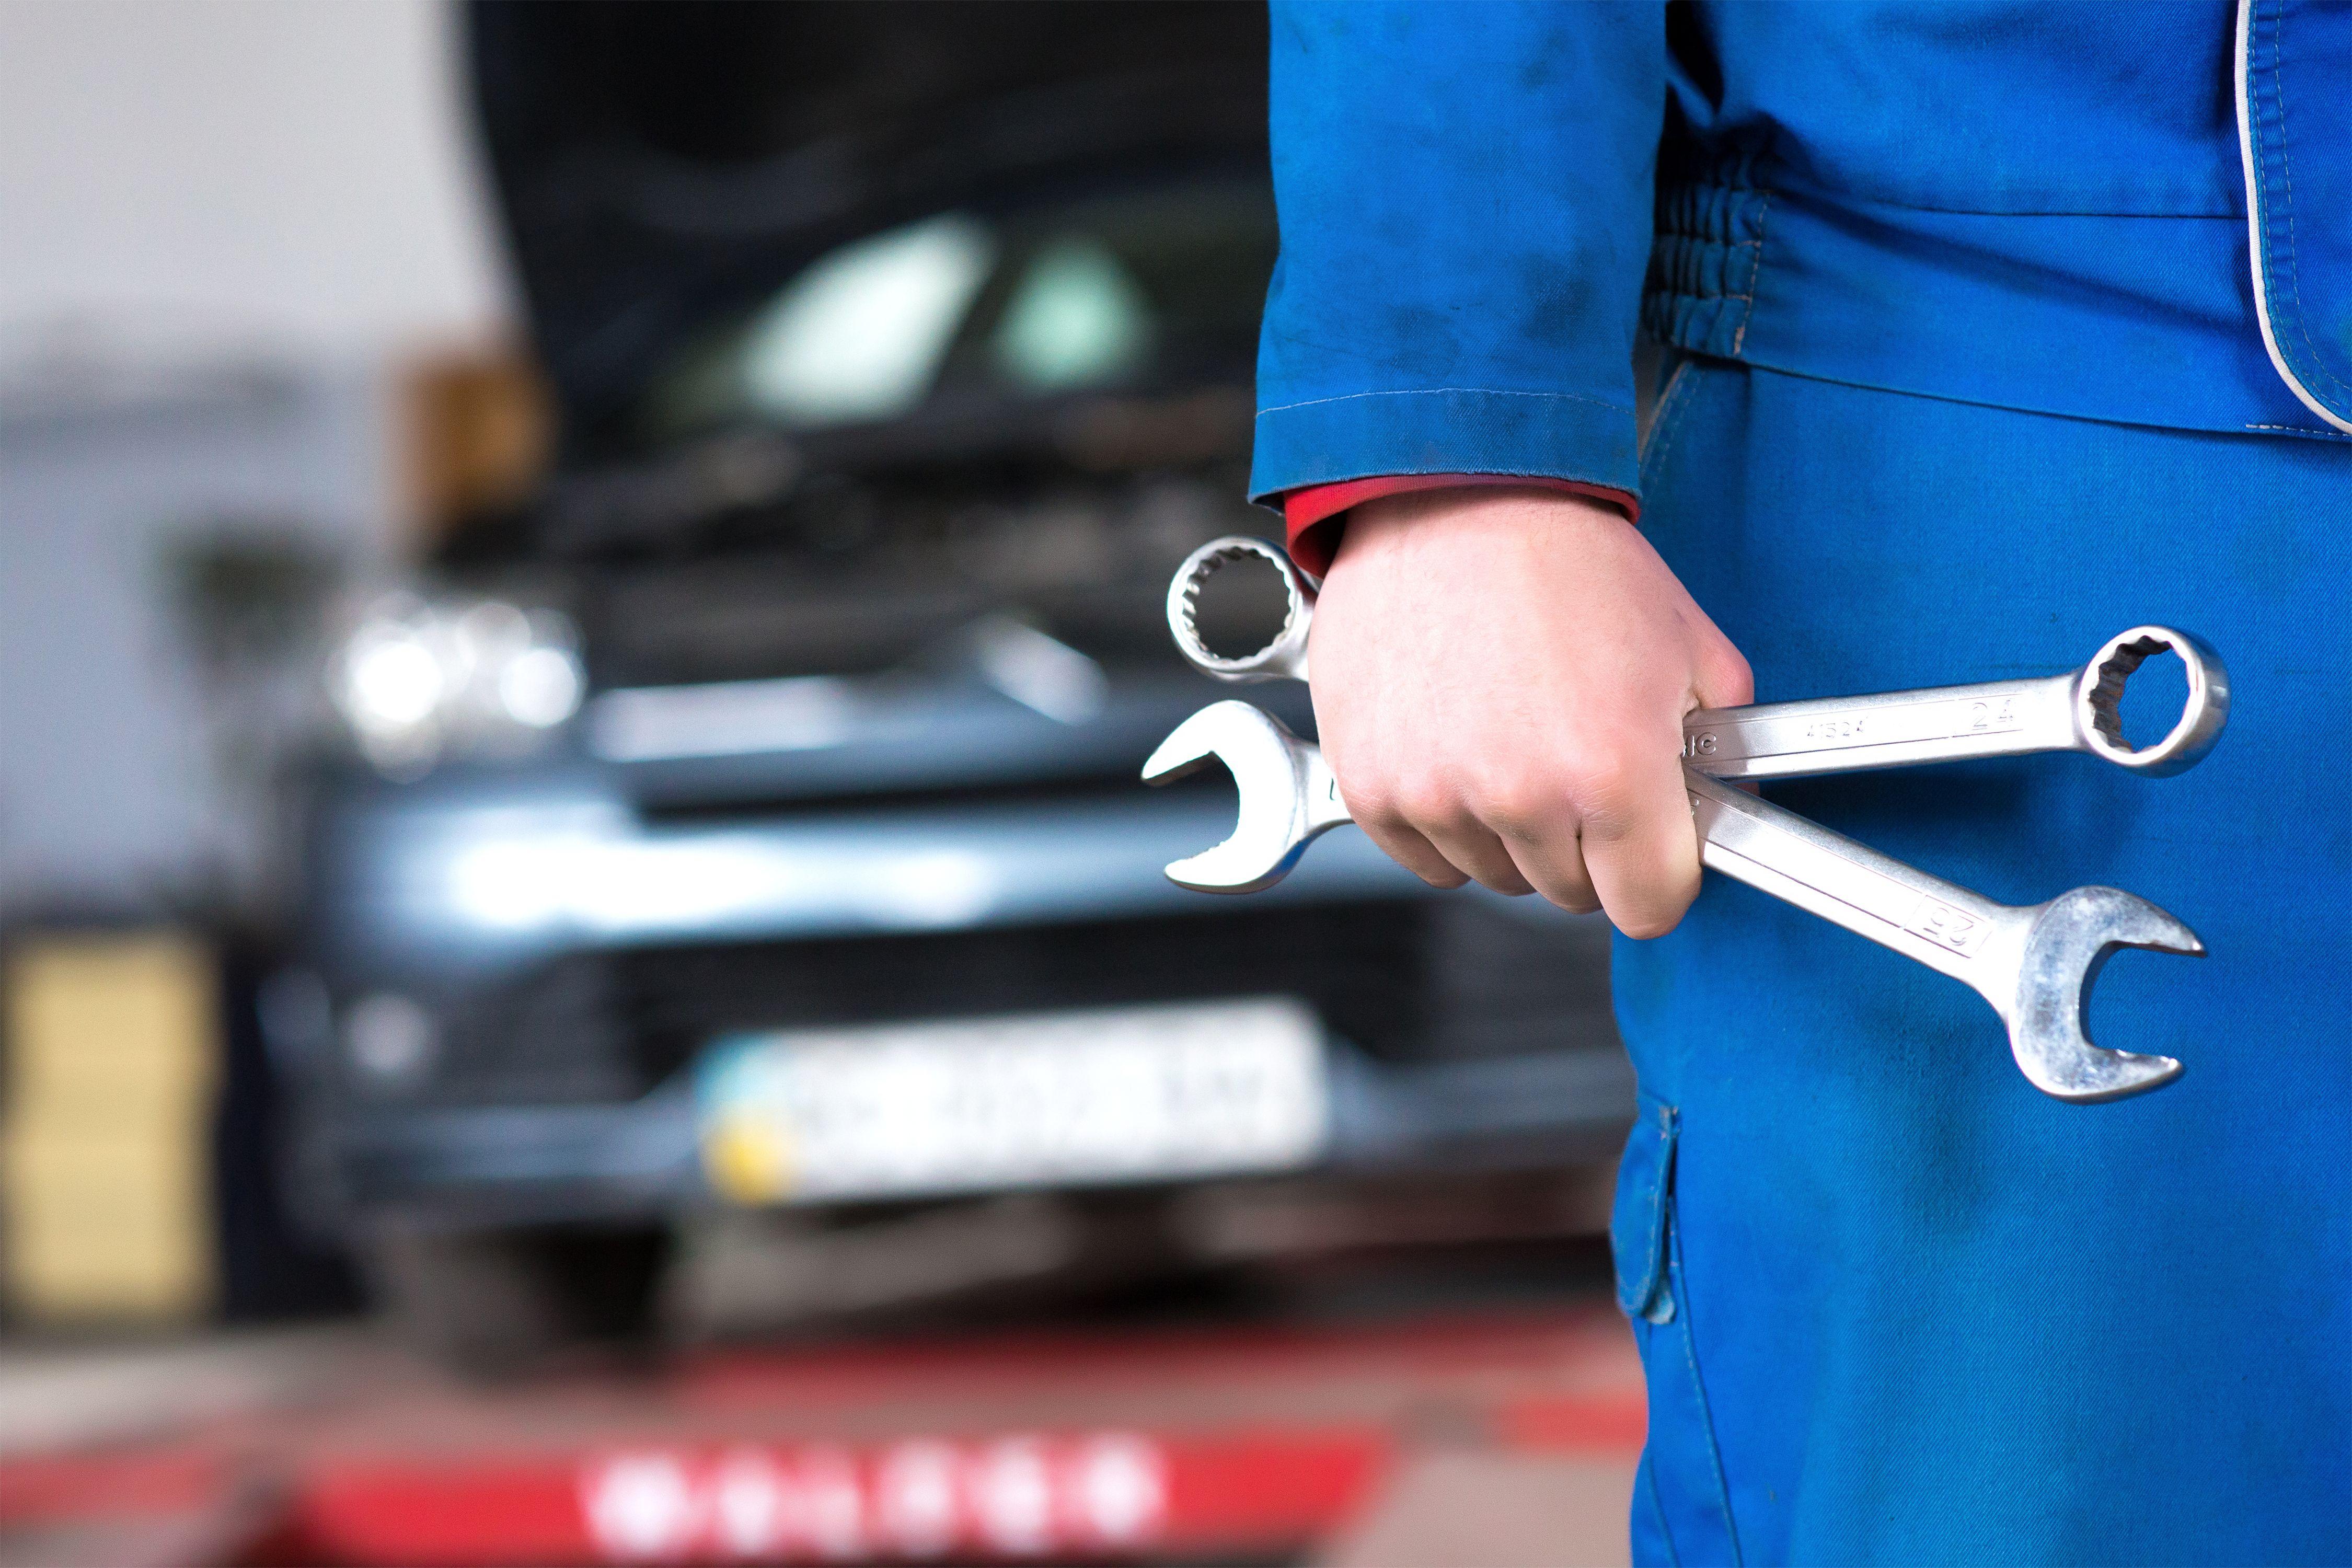 Mantenimiento de vehículos en Palma de Mallorca